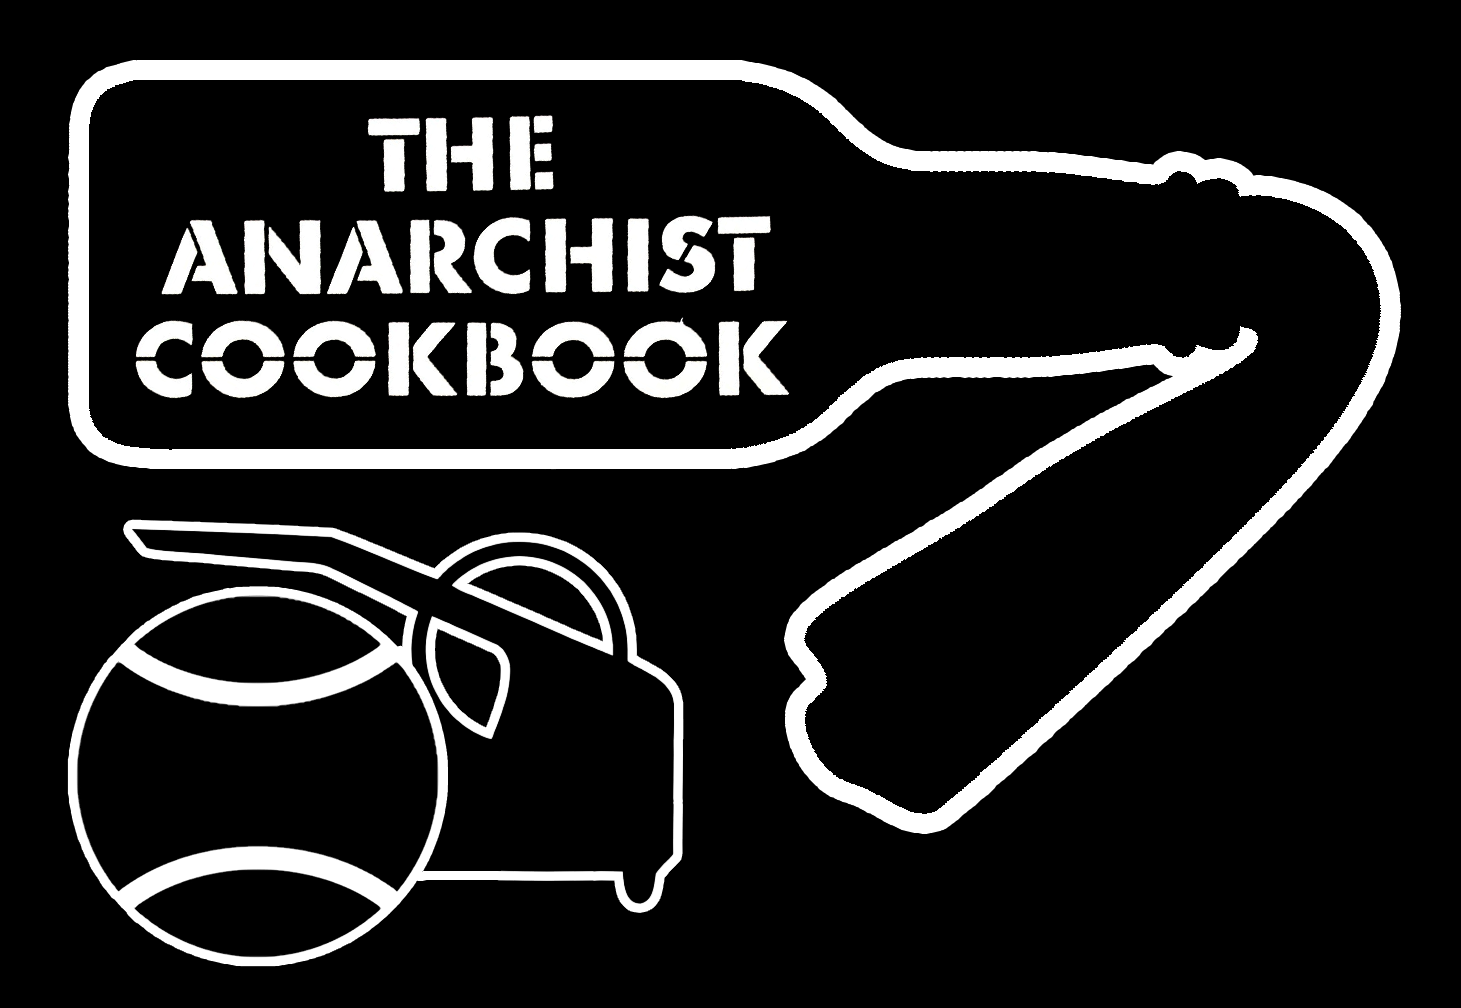 Anarchist Cookbook, molotov